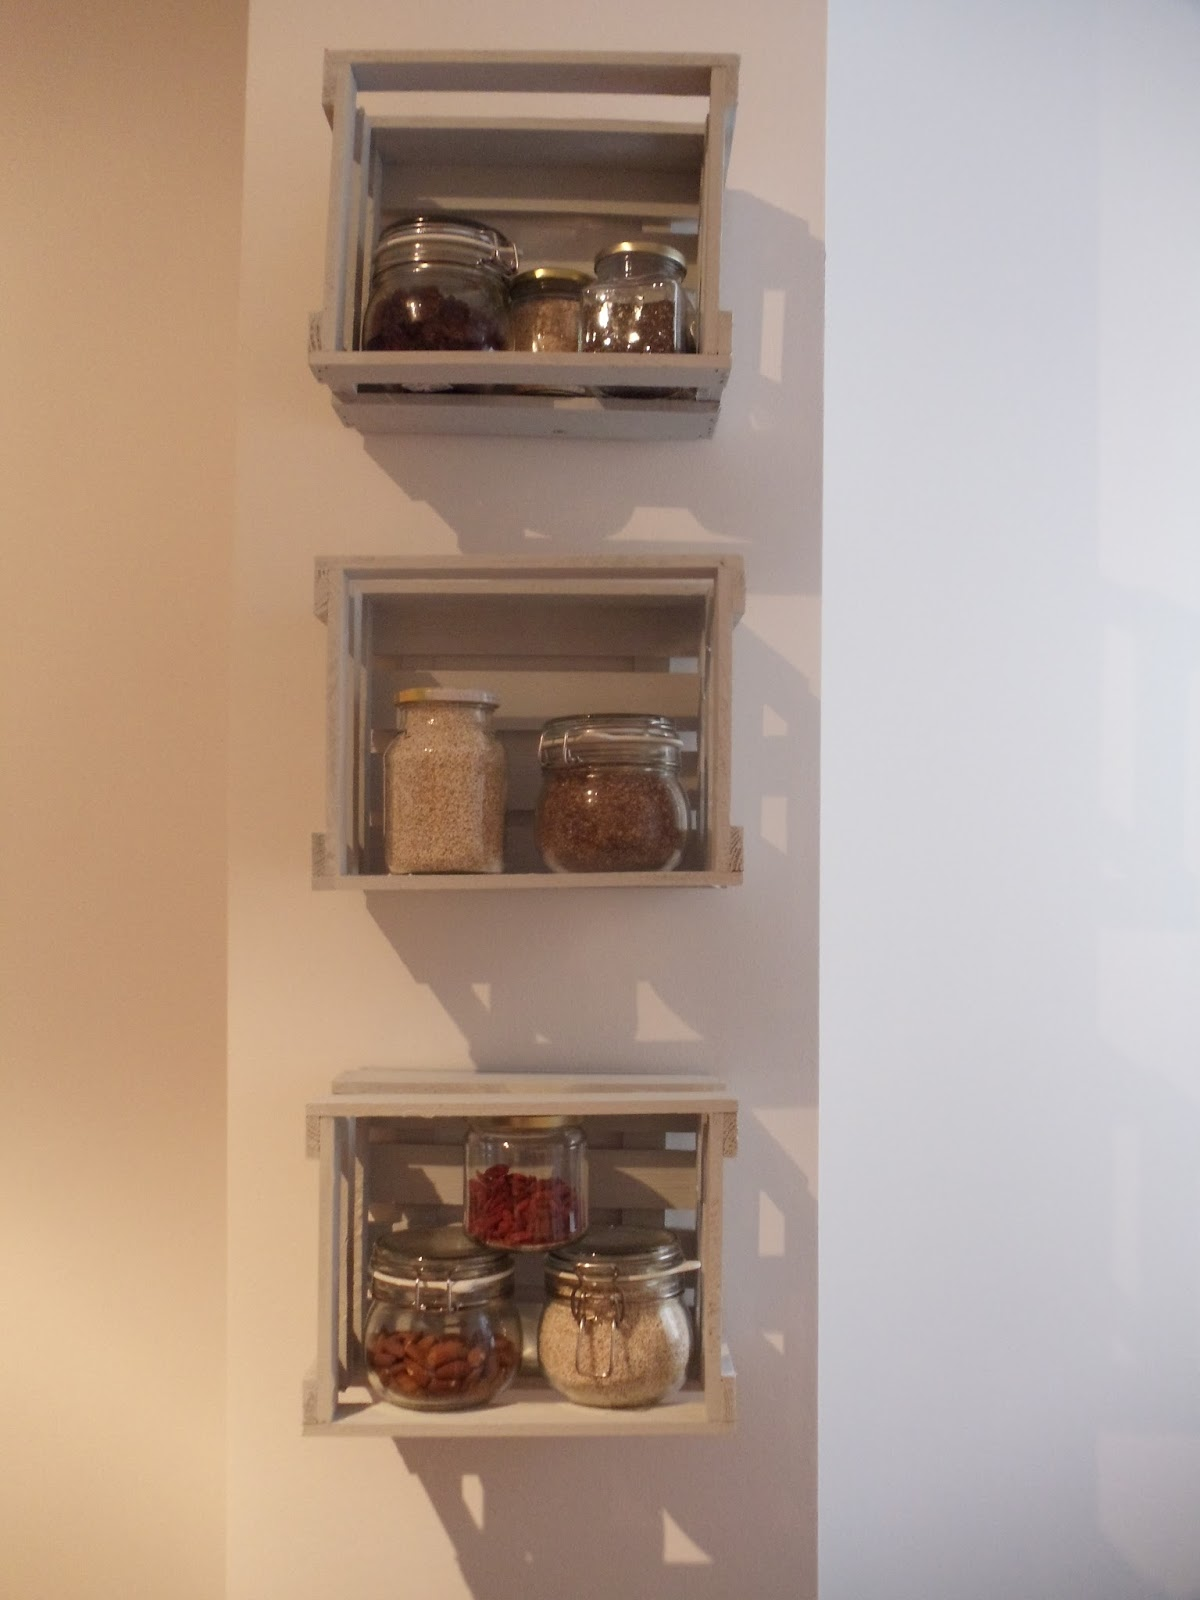 diy m sli regal topf schere papier. Black Bedroom Furniture Sets. Home Design Ideas